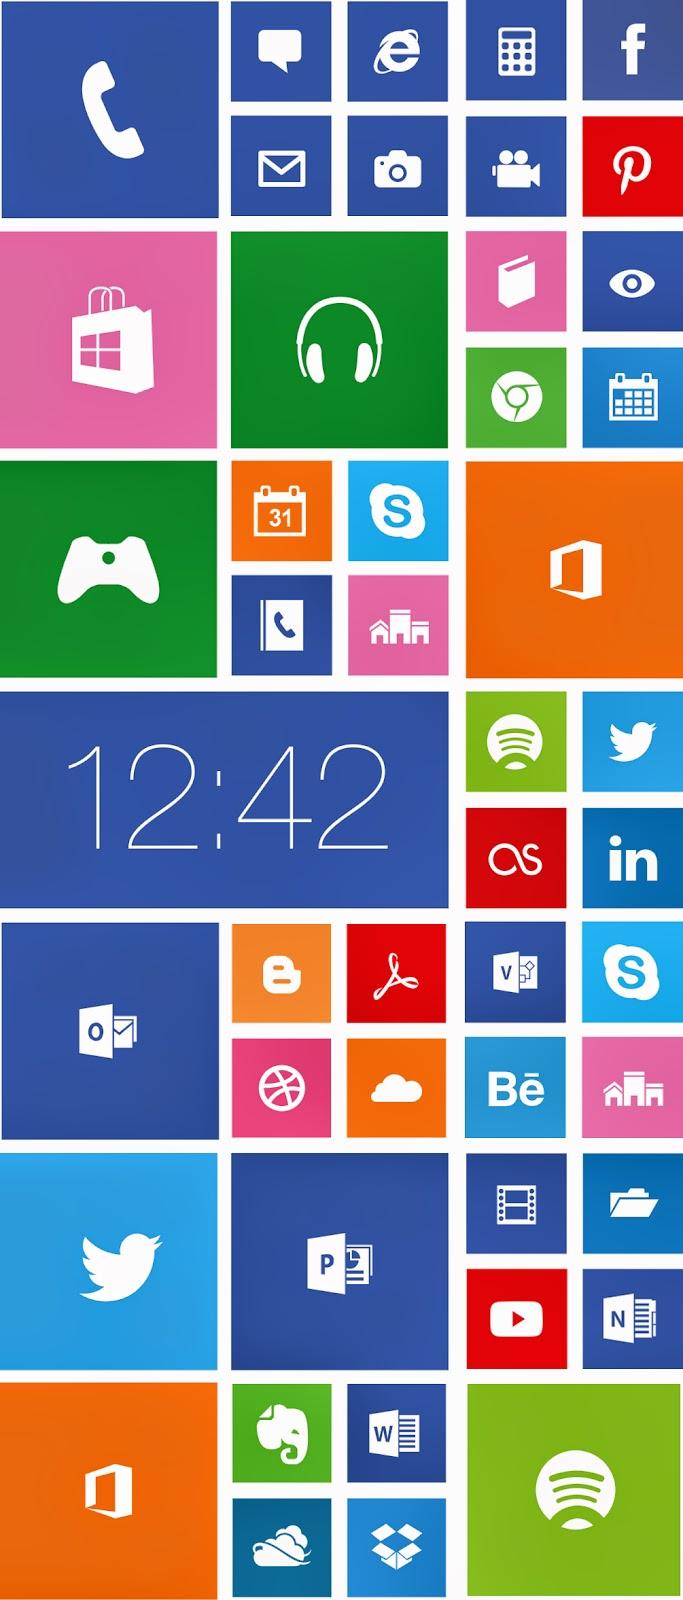 Windows 8 Icons Vector Wp8 windows phone 8 icons uiWindows 8 Vector Icon